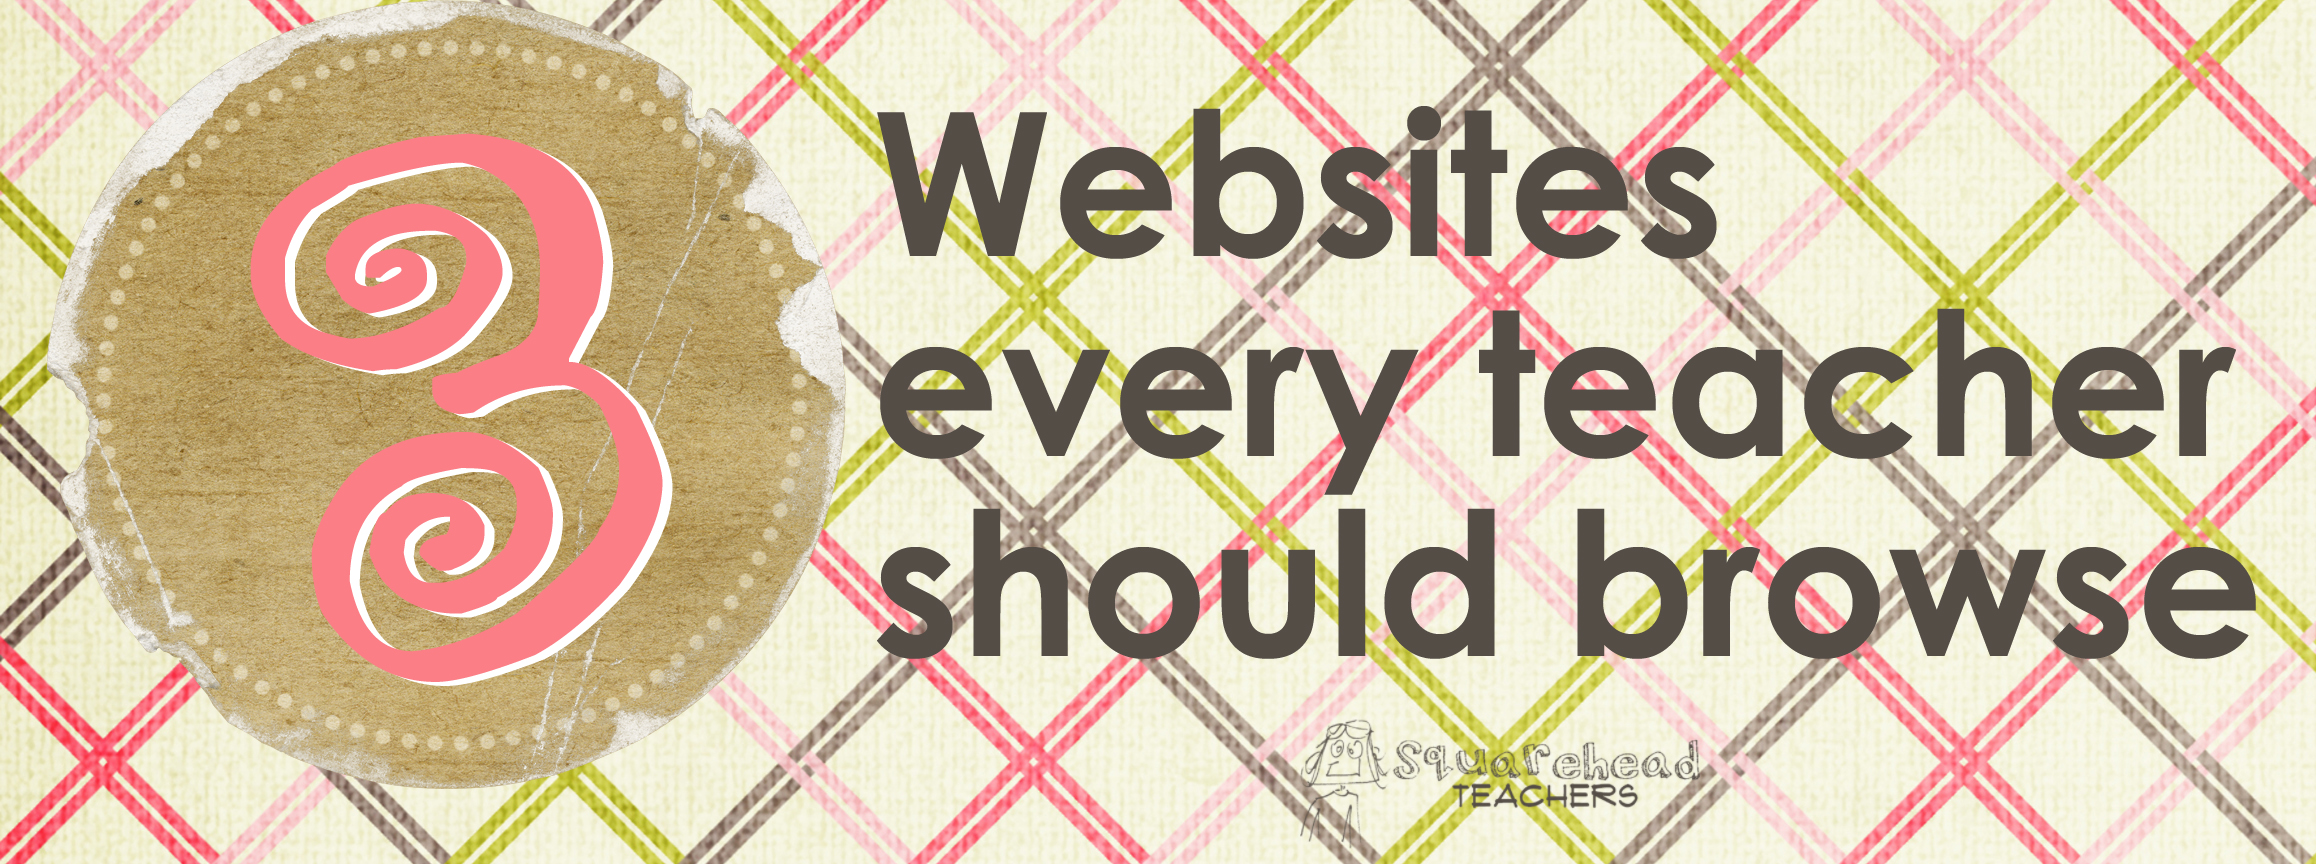 Teaching websites australia 2013